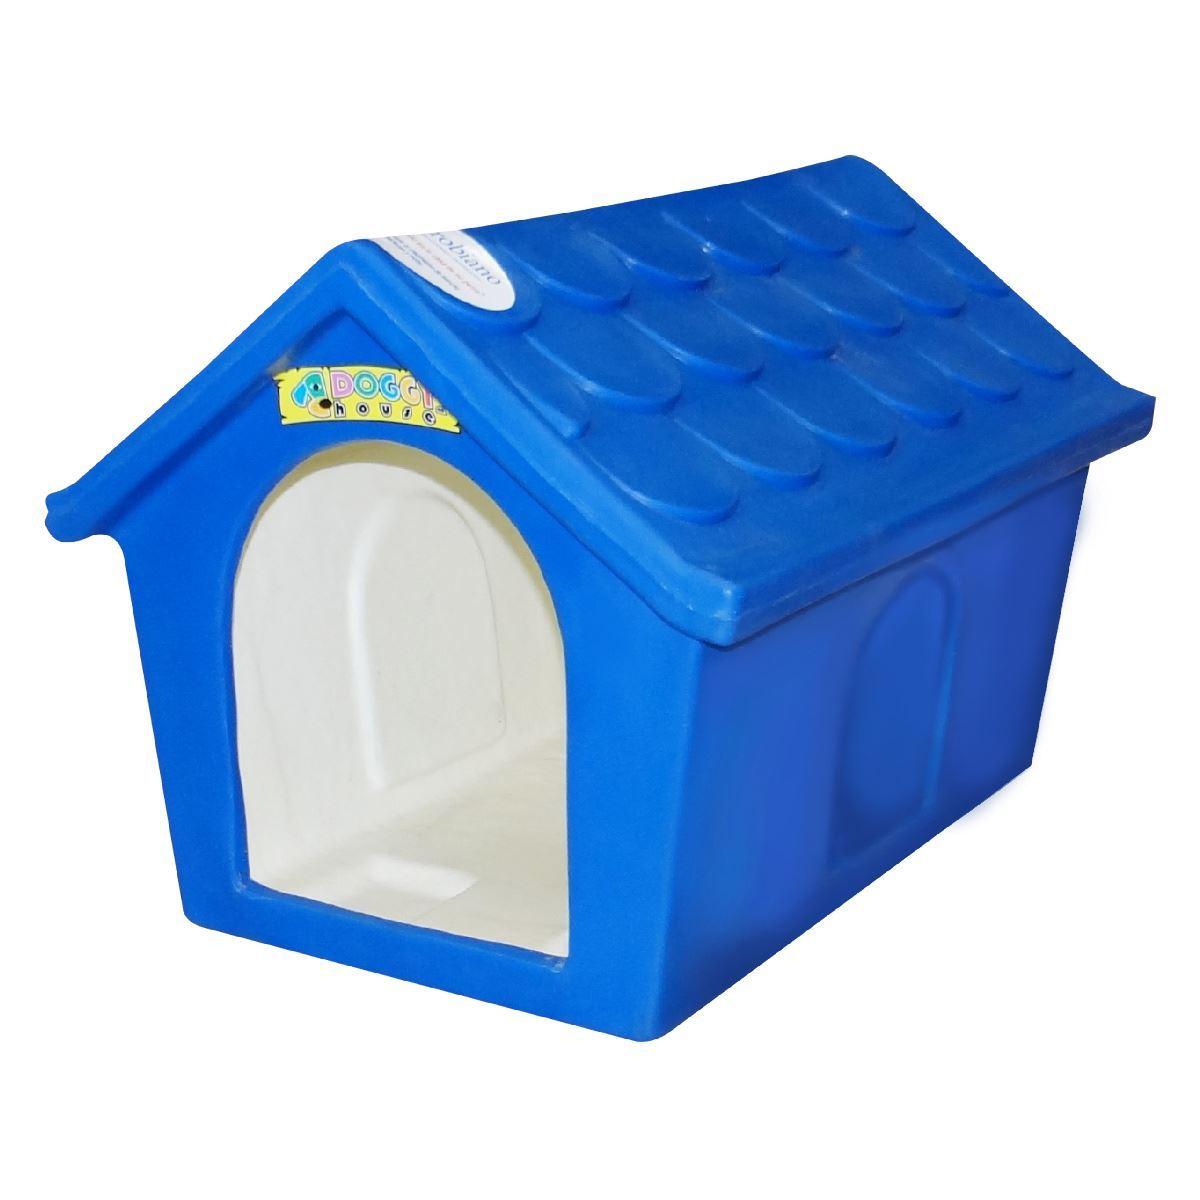 Casa para perro clasica peque a doggy house azul for Casa piscitelli musica clasica